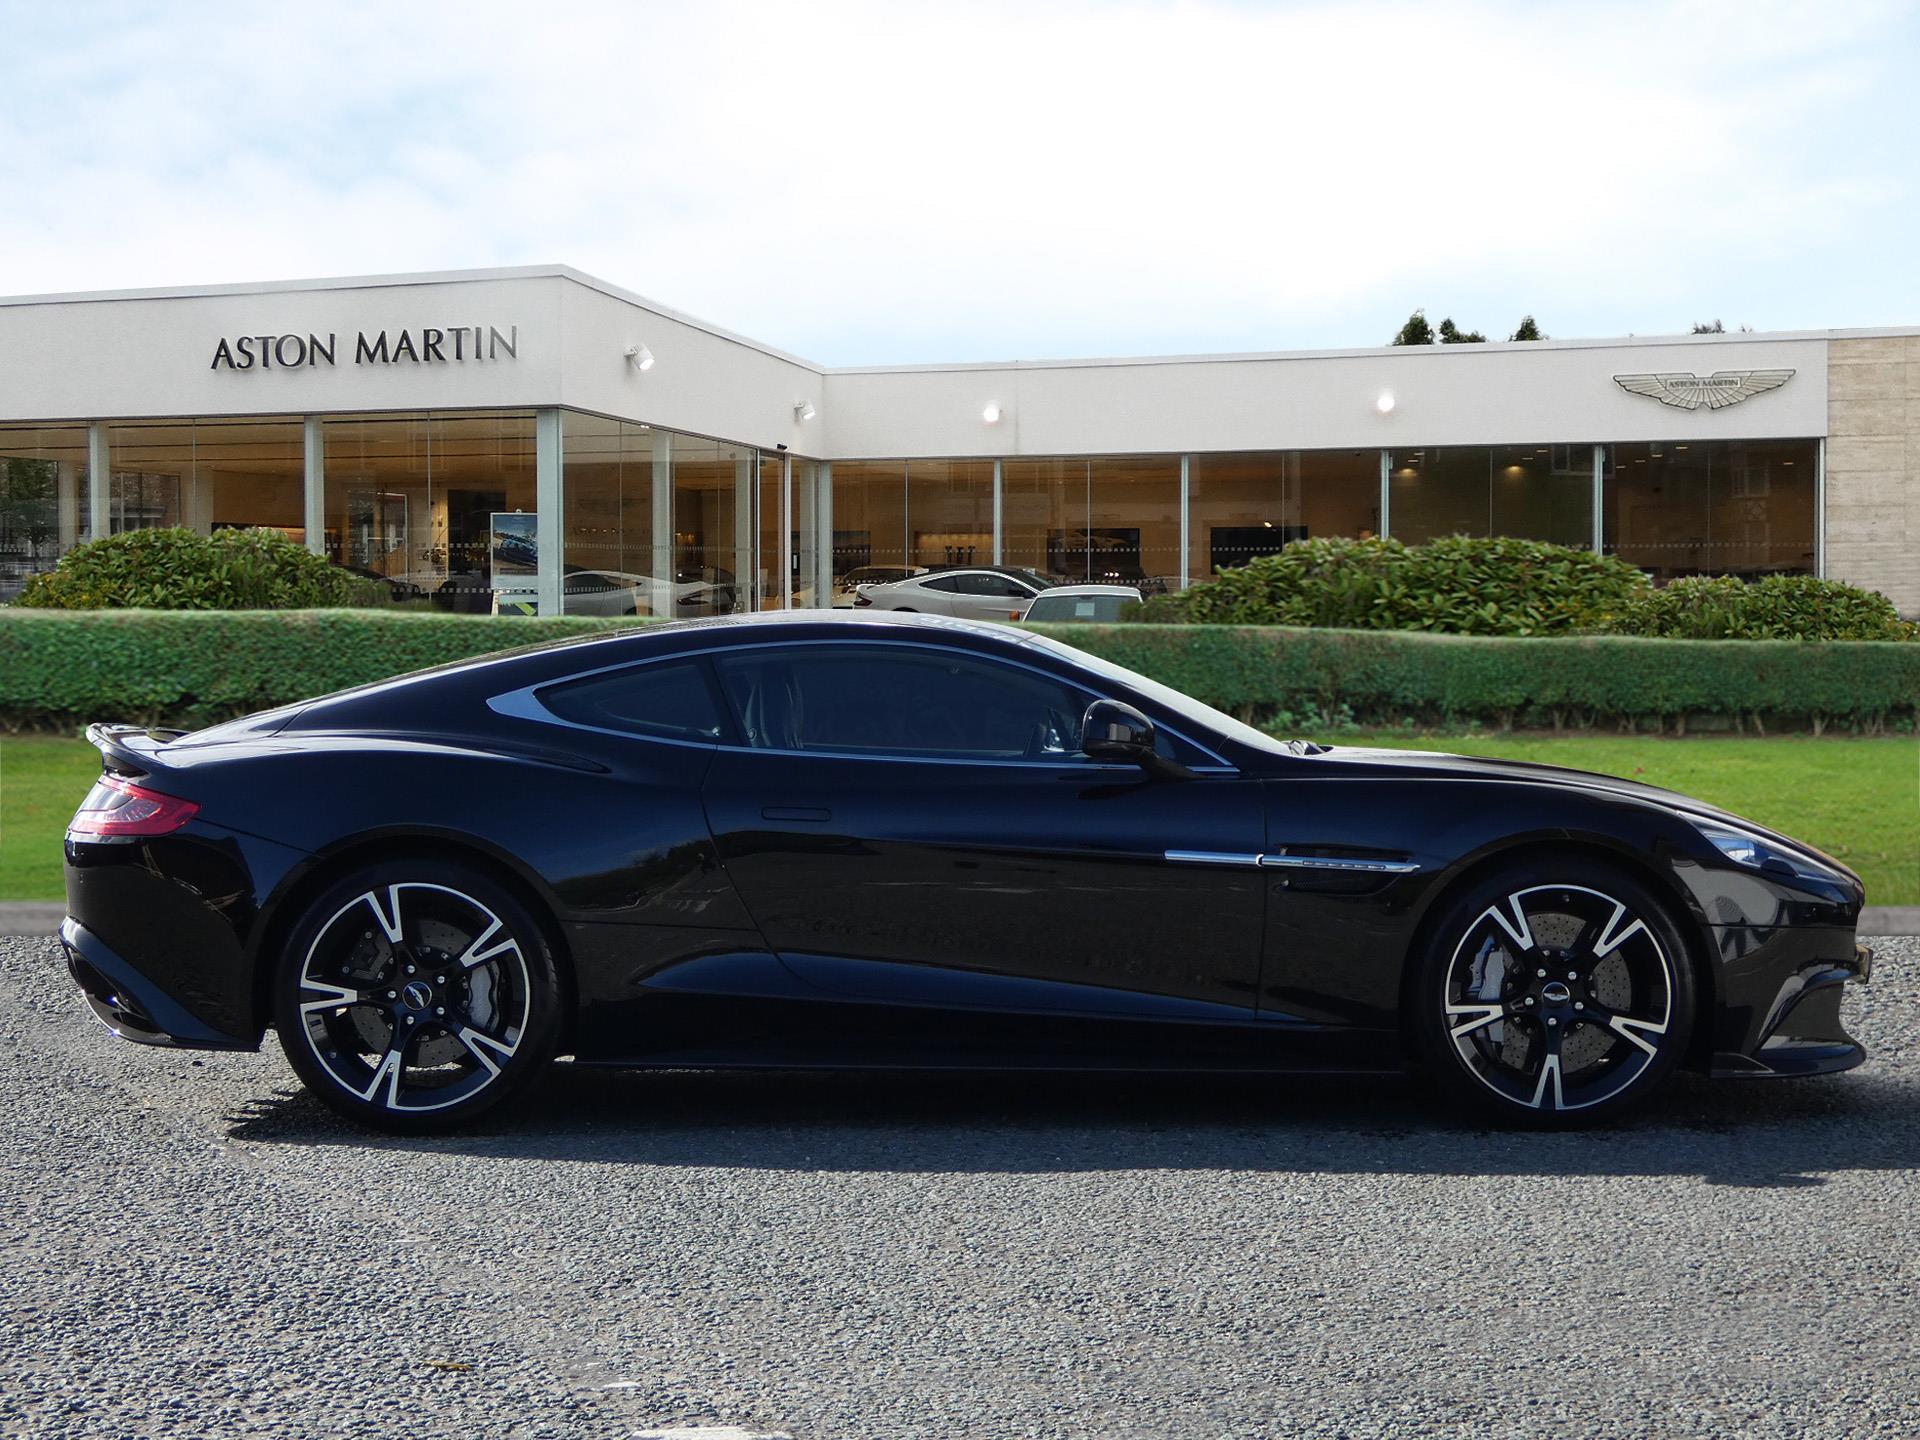 Aston Martin Lagonda   Pre Owned U0026 Used Aston Martins   Car Details    Vanquish S Coupe   MK17FKO